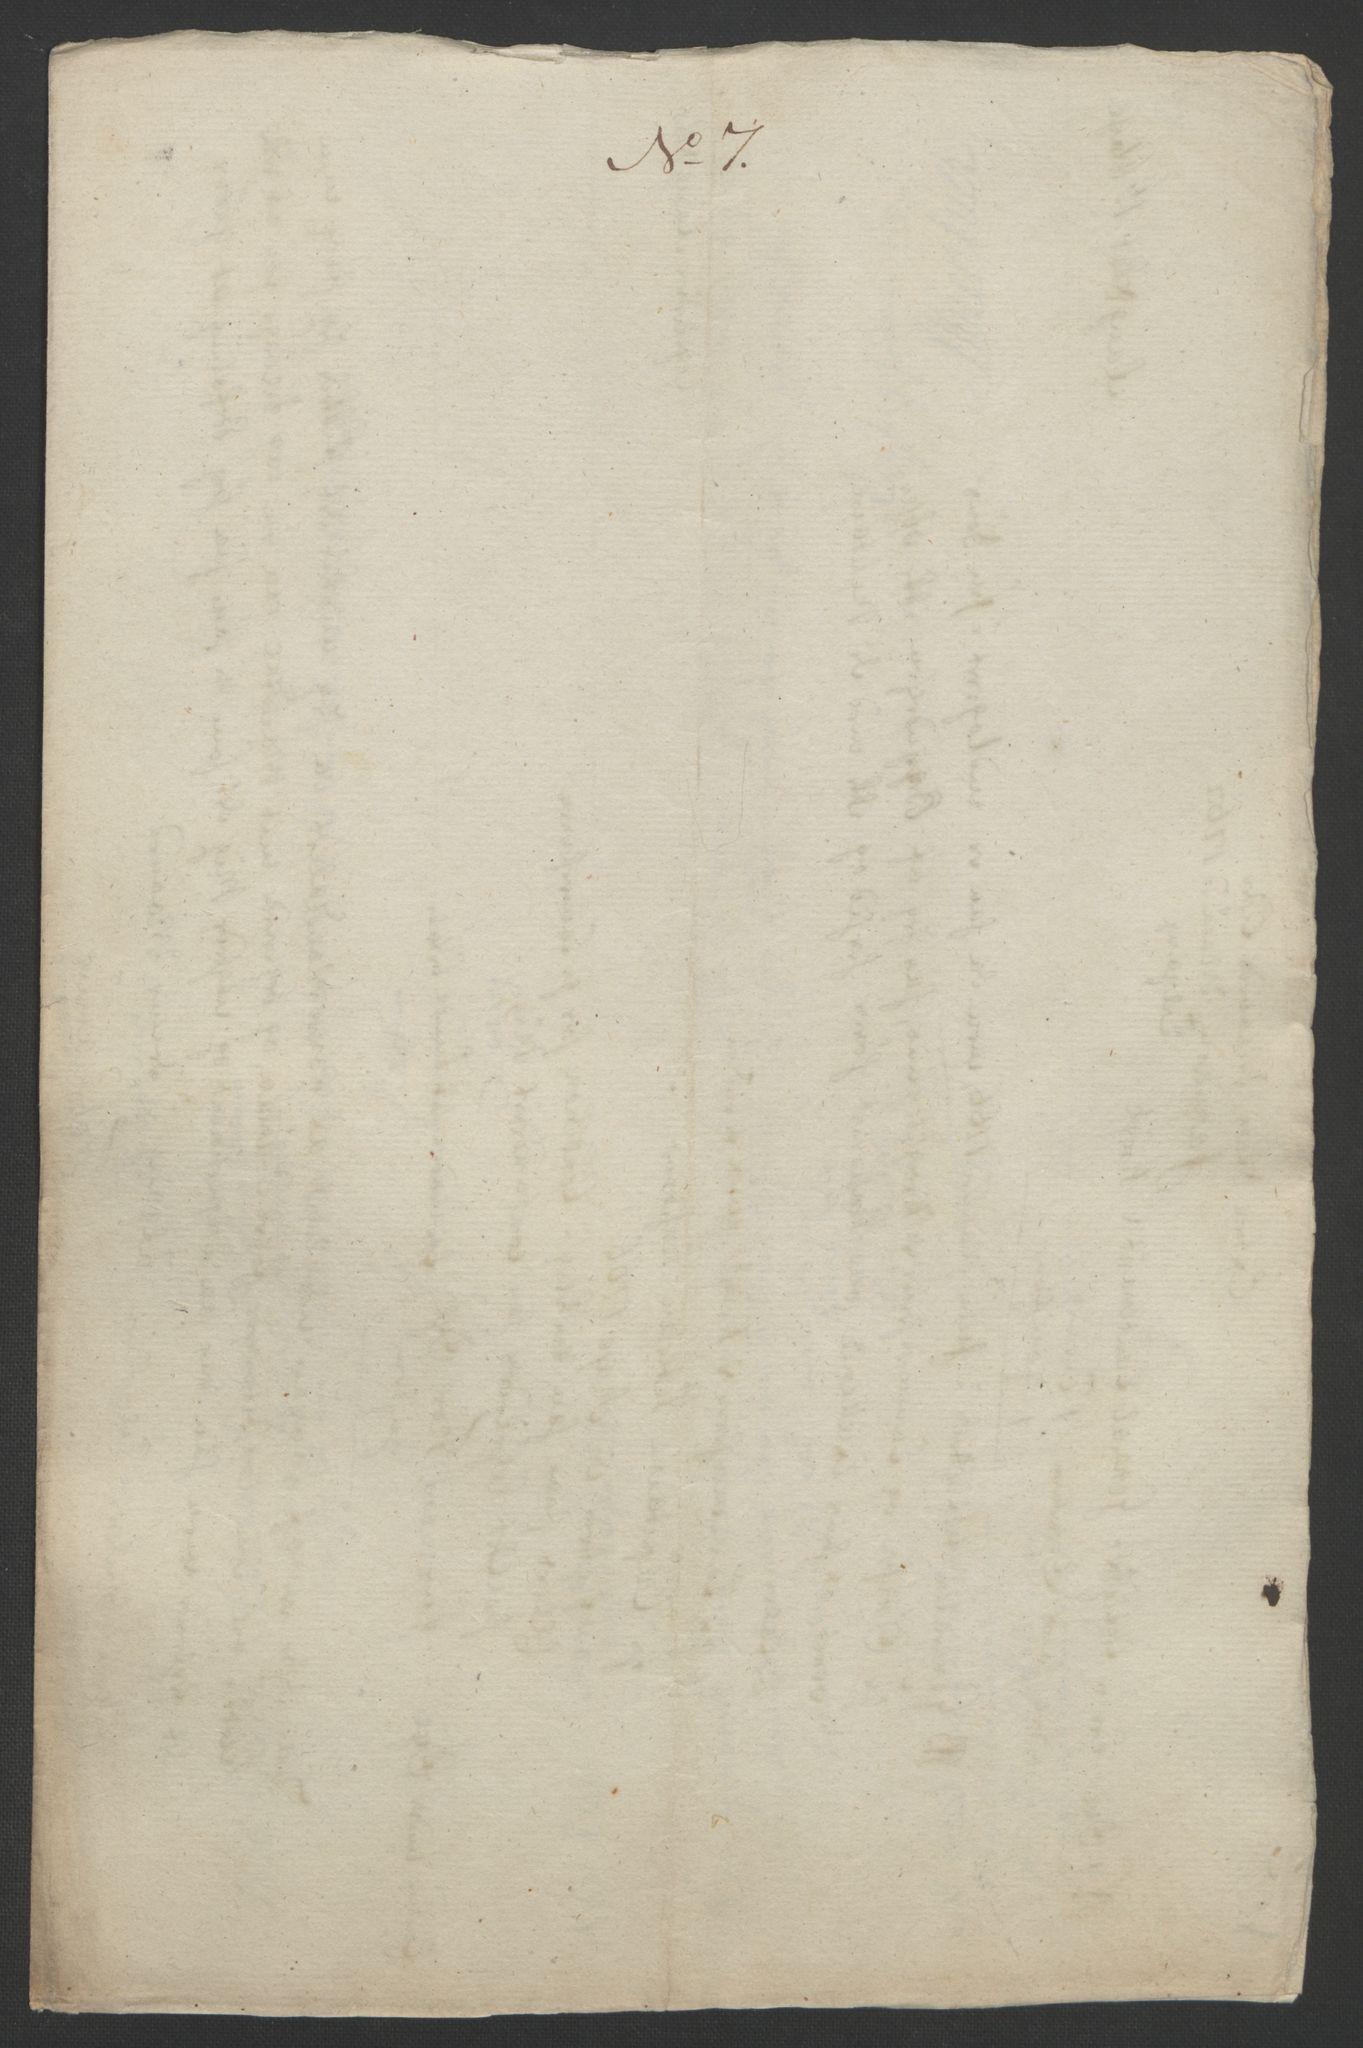 RA, Rentekammeret inntil 1814, Realistisk ordnet avdeling, Ol/L0021: [Gg 10]: Ekstraskatten, 23.09.1762. Orkdal og Gauldal, 1762-1767, s. 805